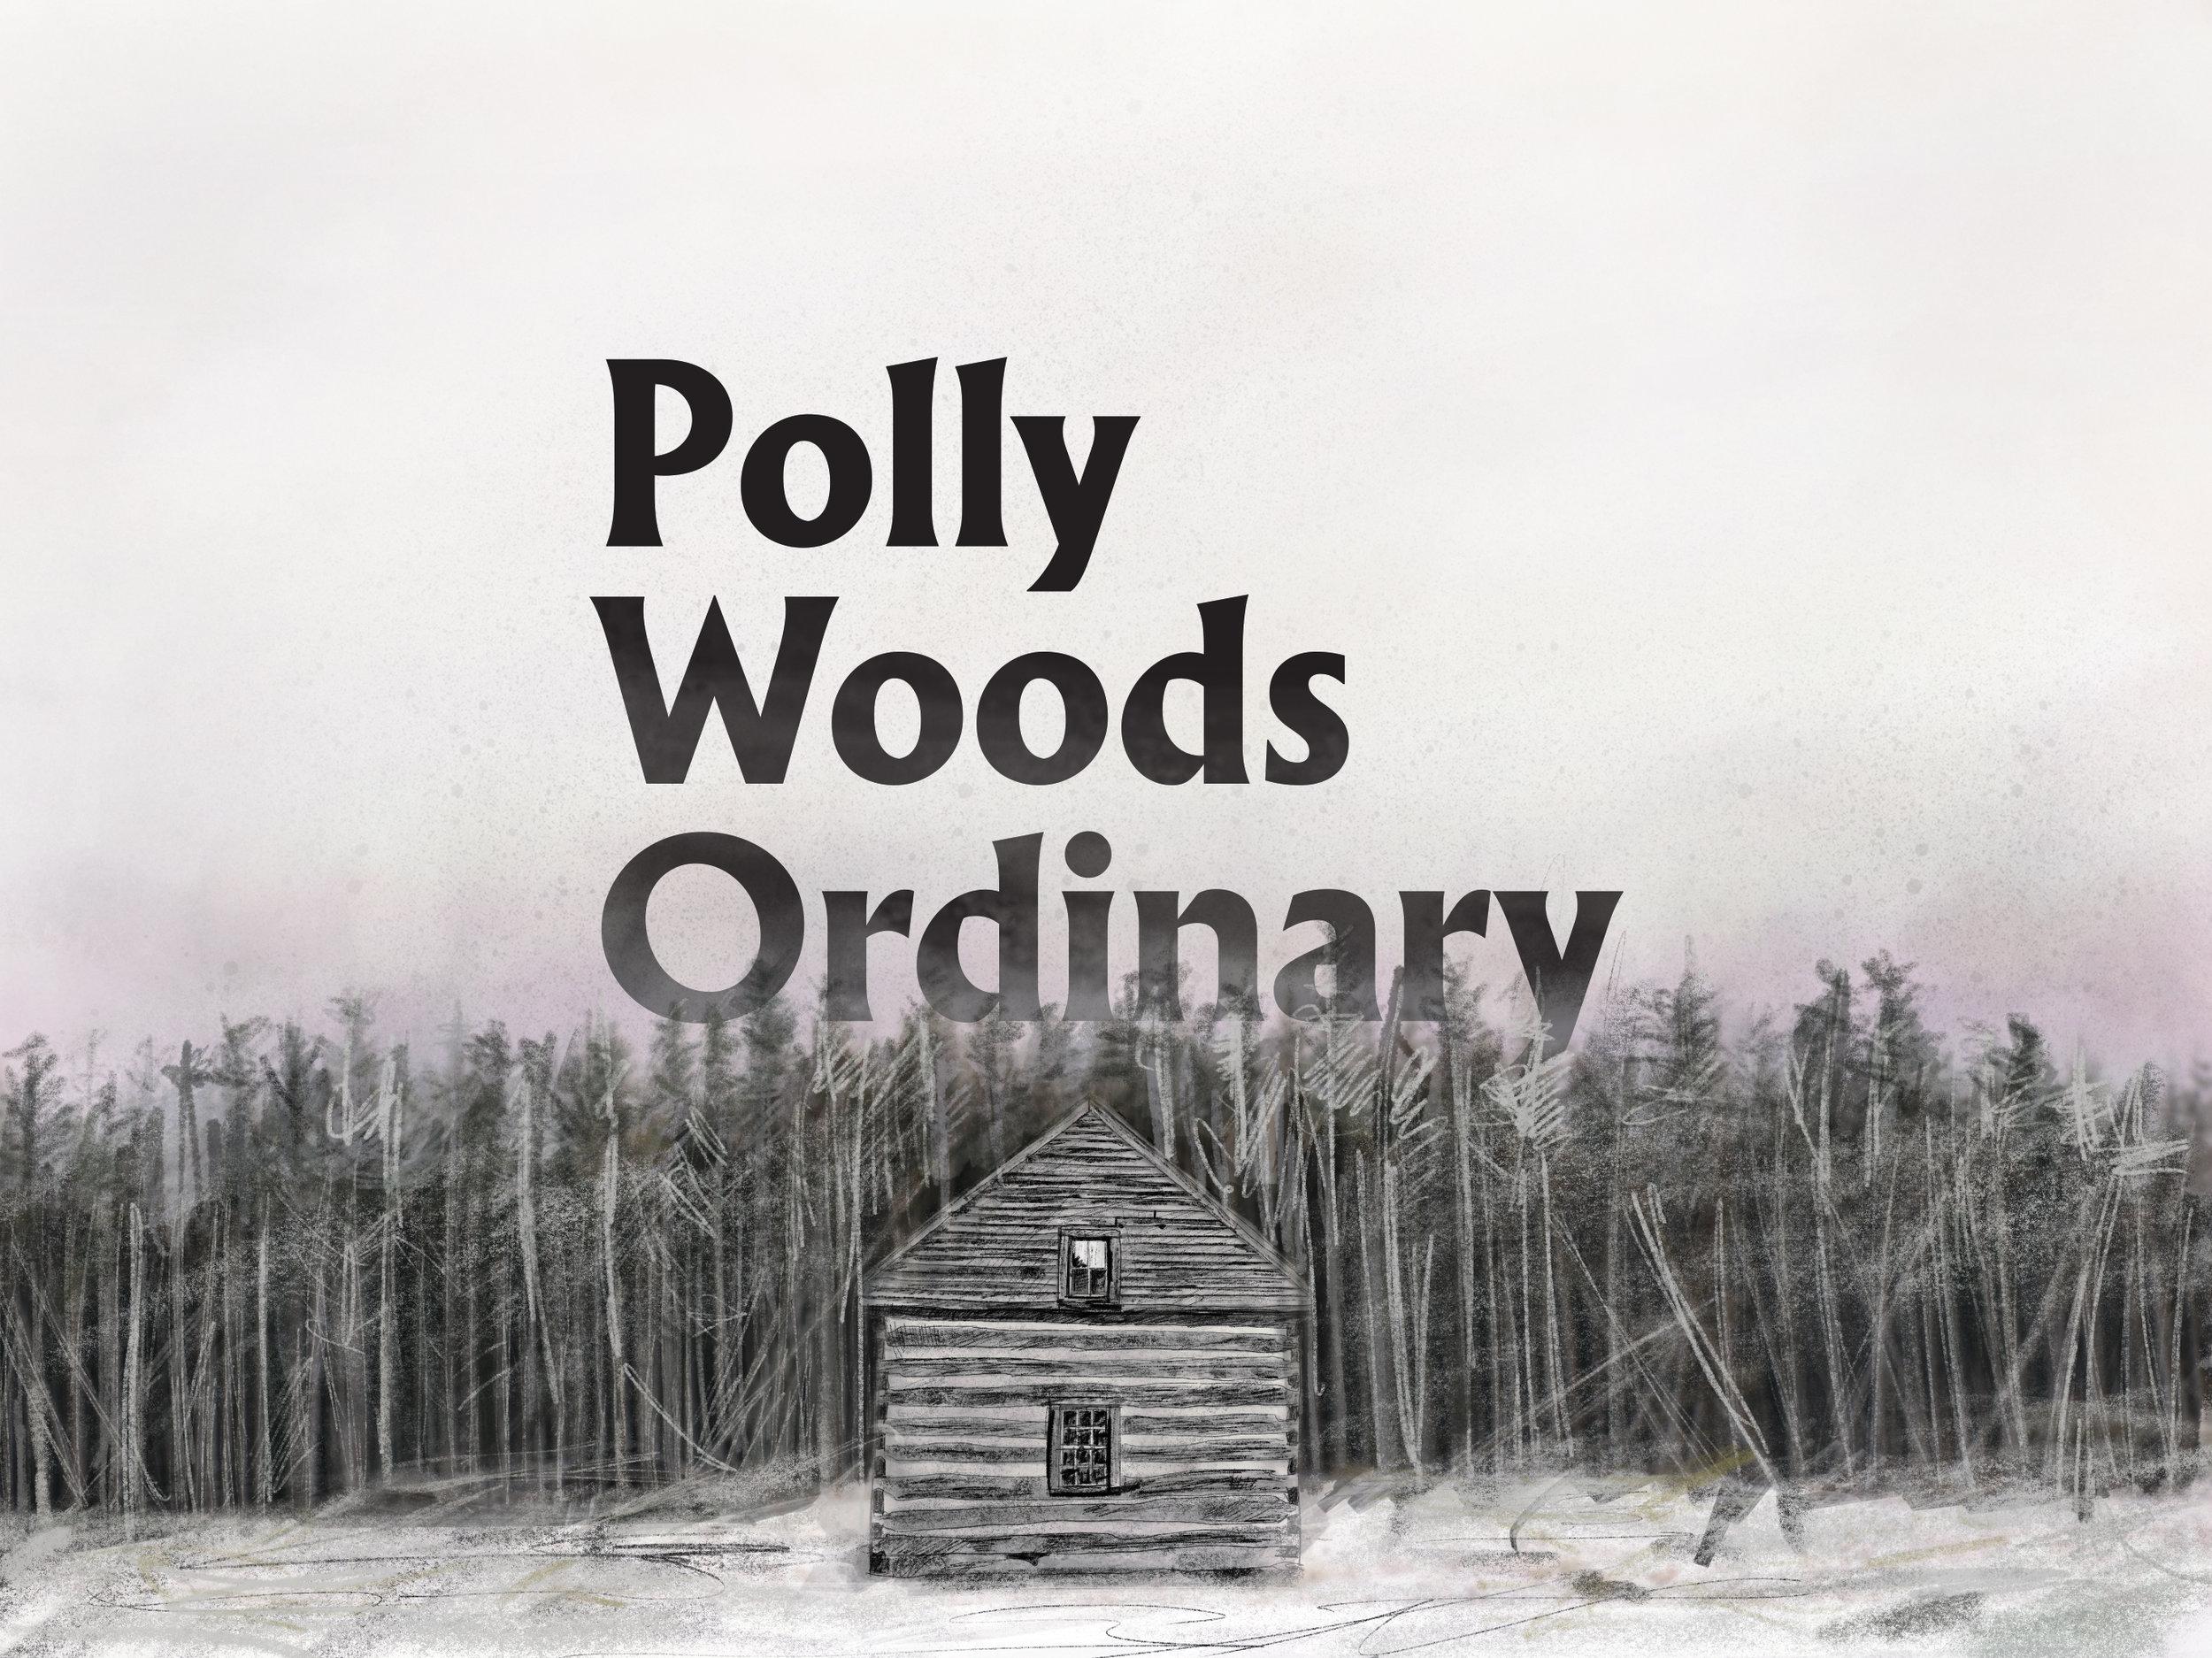 Polly-Woods-Ordinary-Cover-Art.jpg